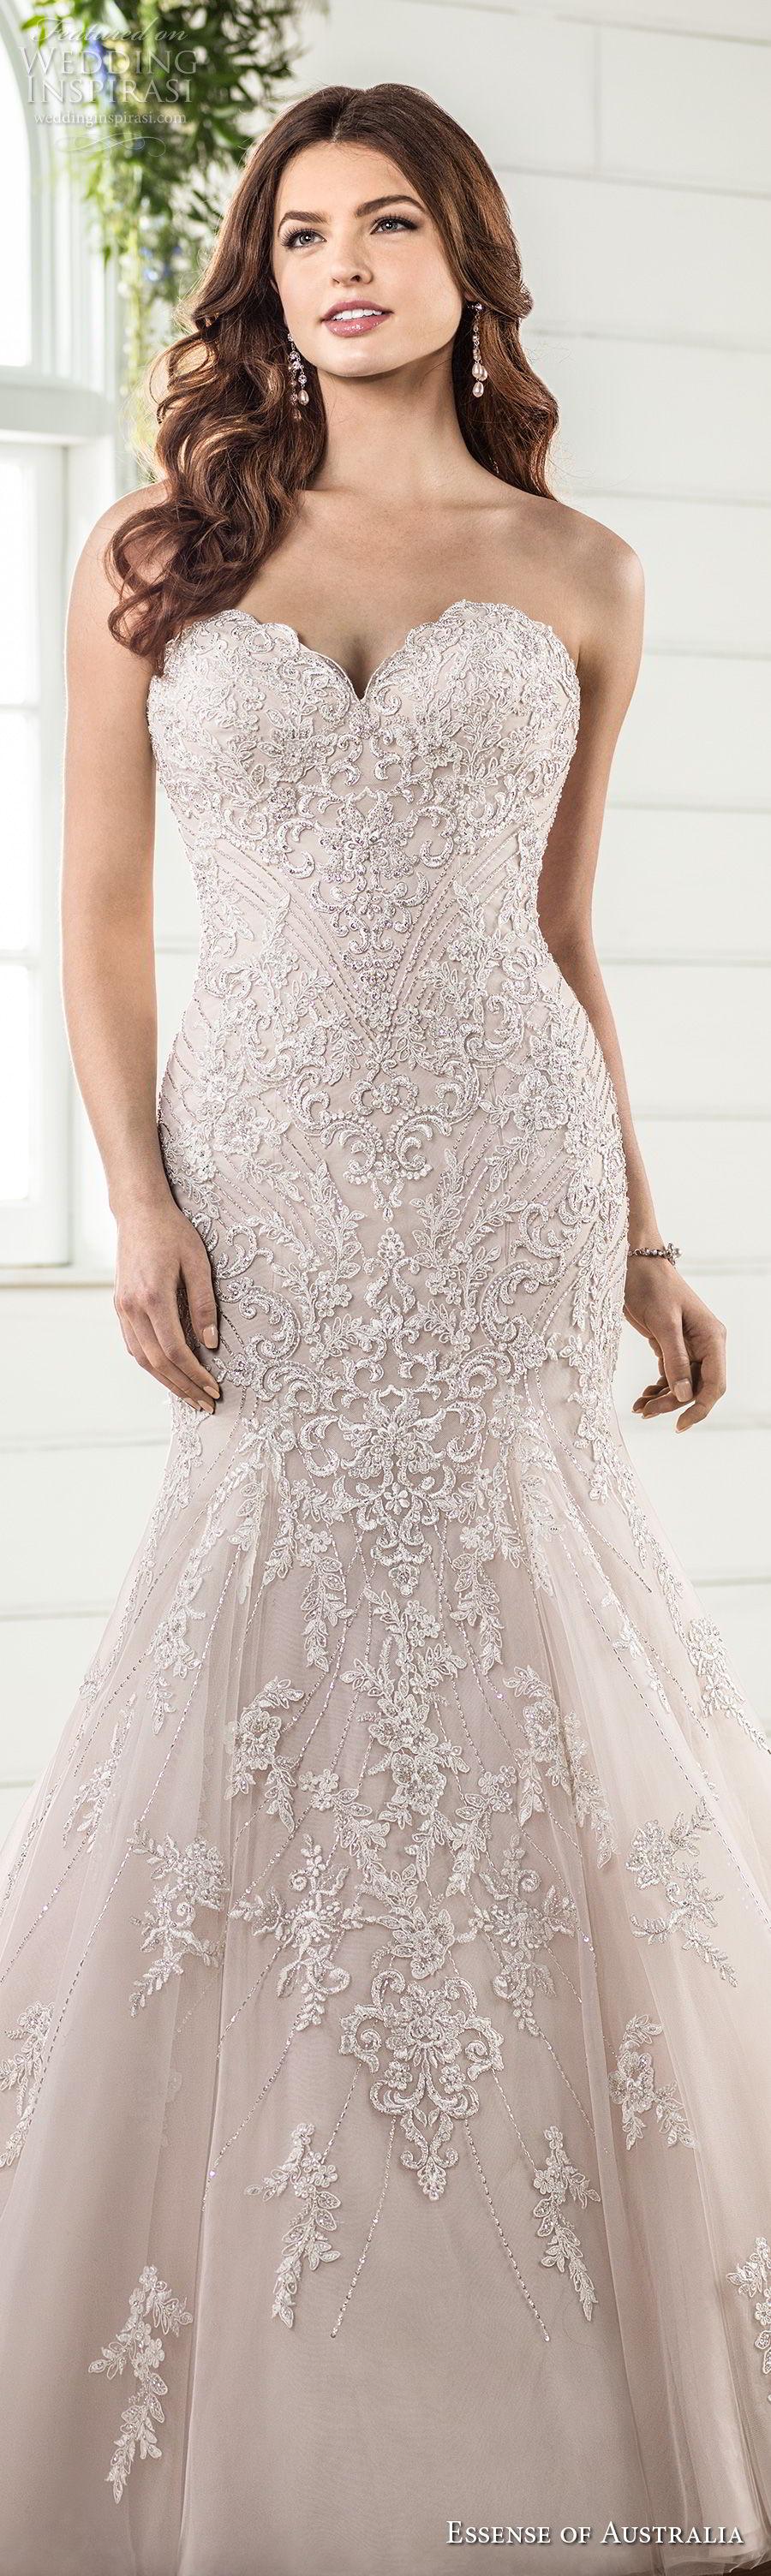 essense australia fall 2017 bridal strapless sweetheart neckline full embellishment elegant romantic blush color mermaid wedding dress chapel train (08) lv